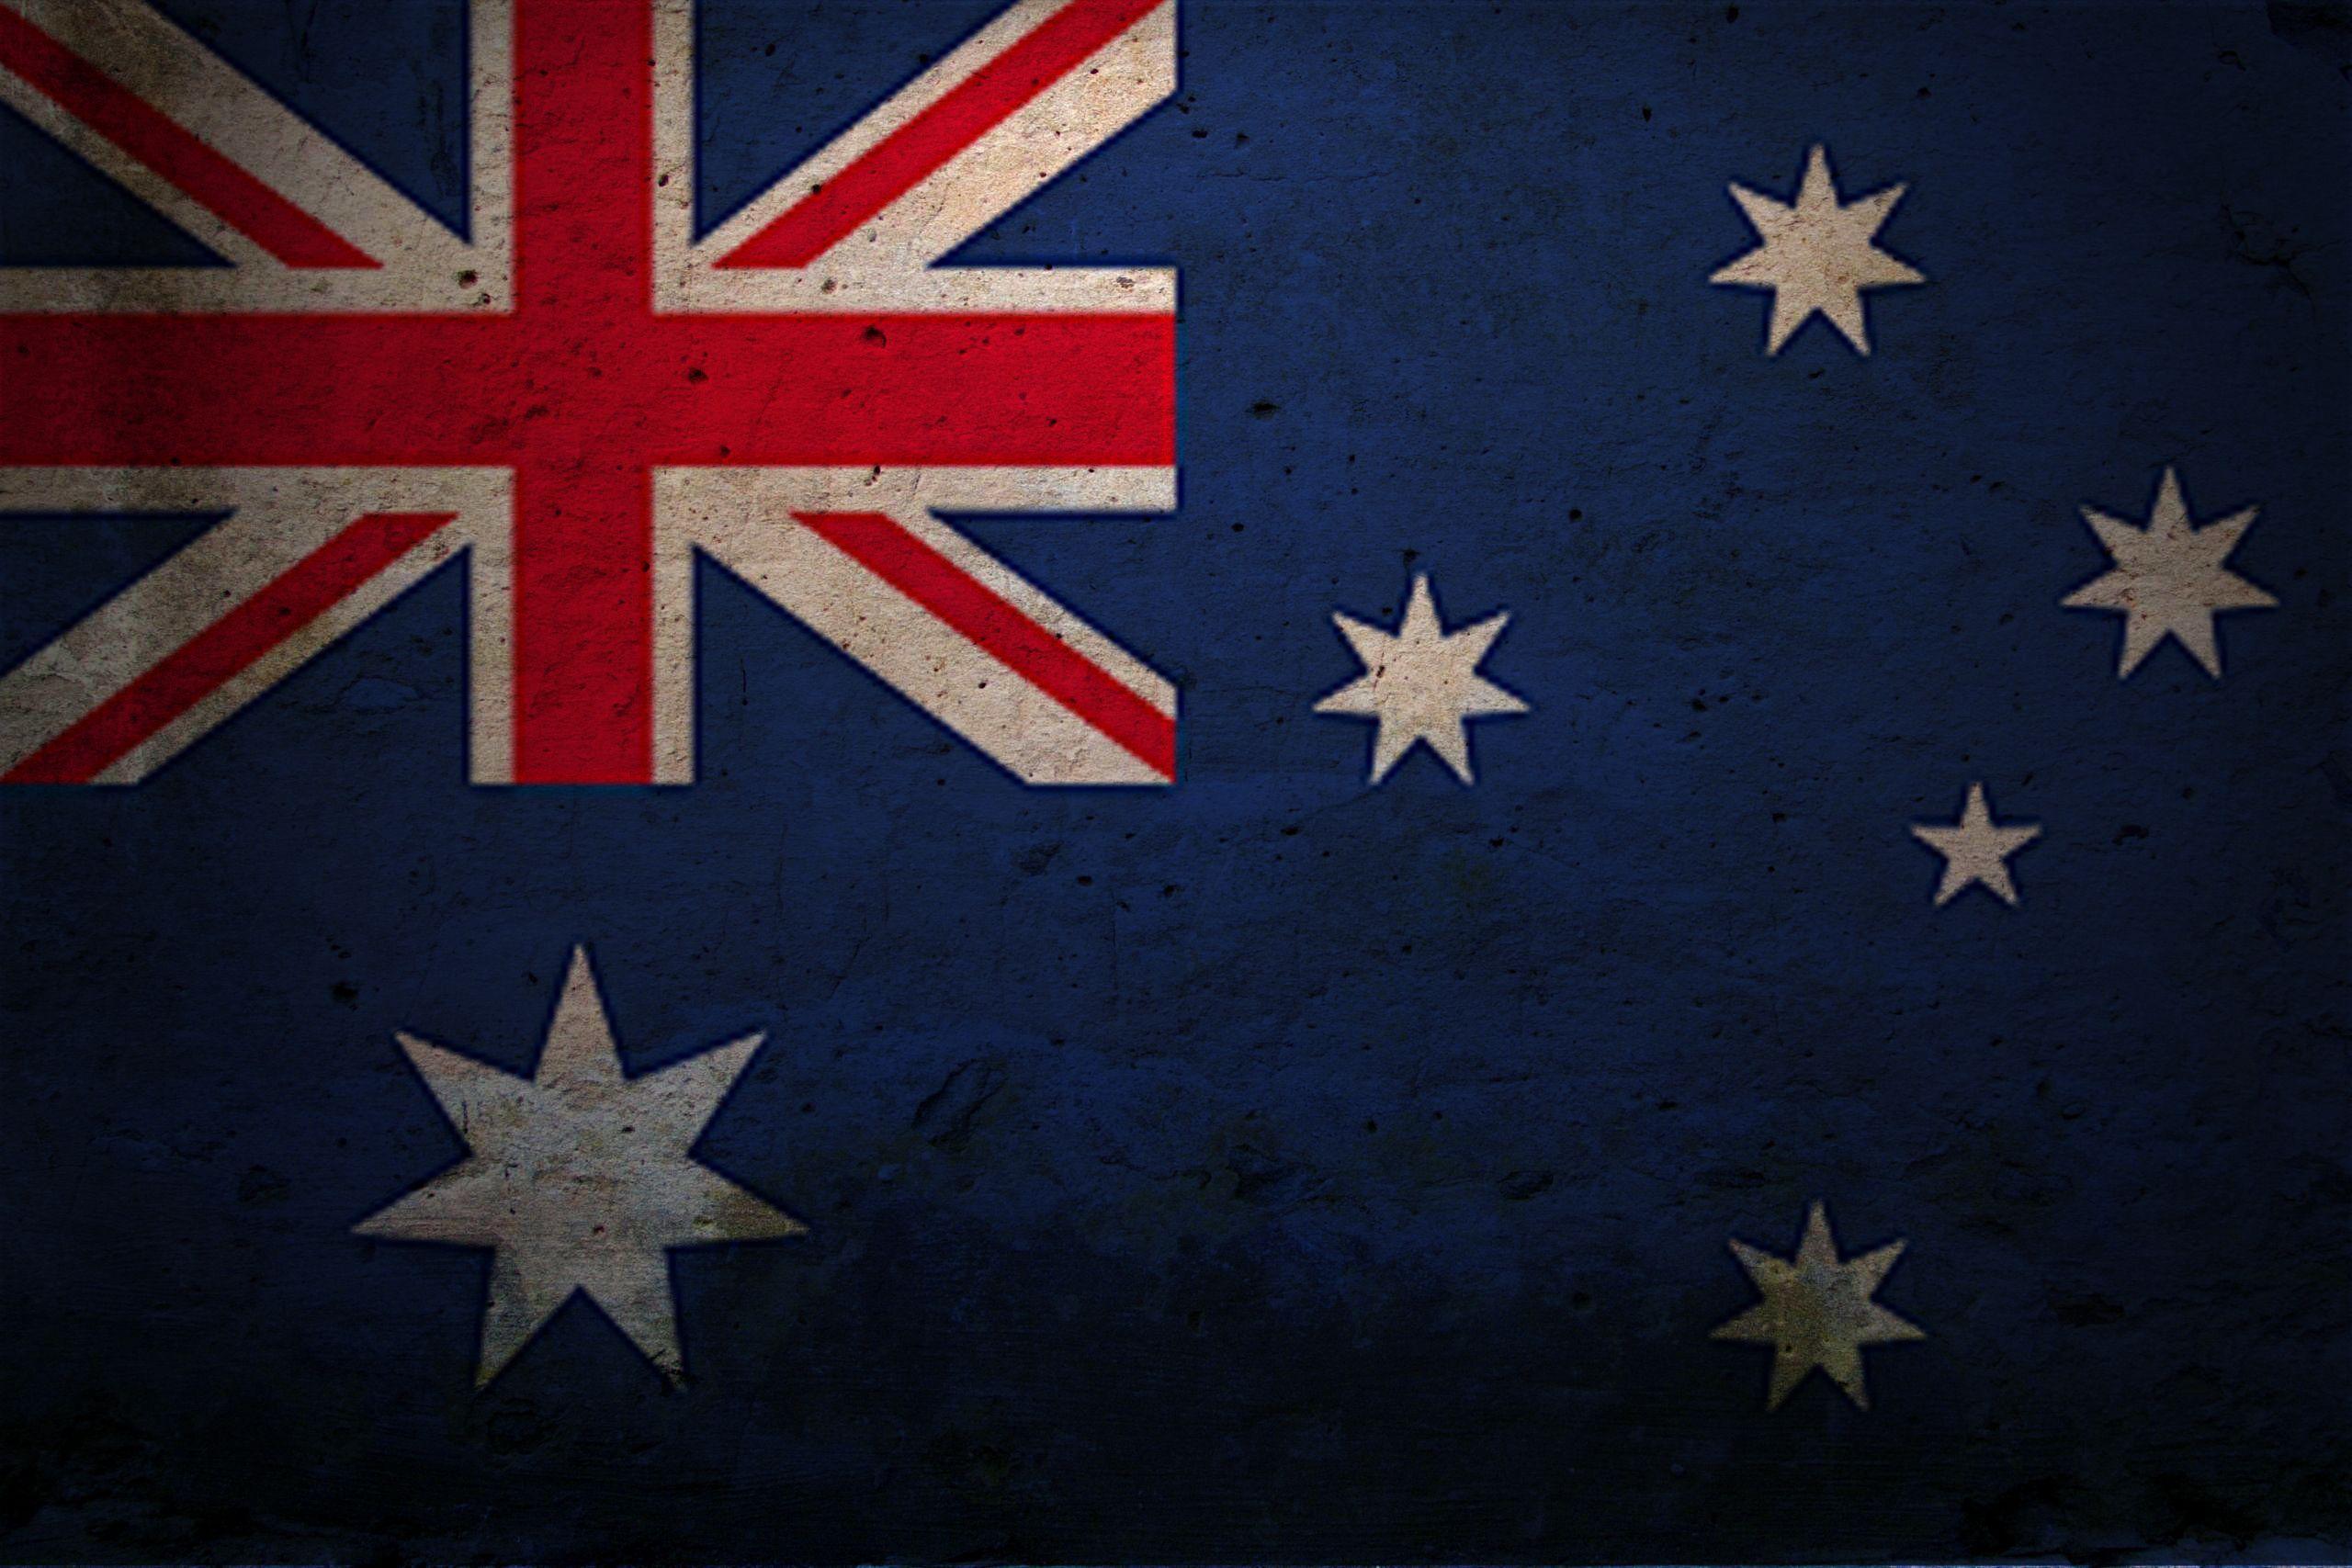 New Zealand Flag Wallpaper: Australia Flag Wallpapers